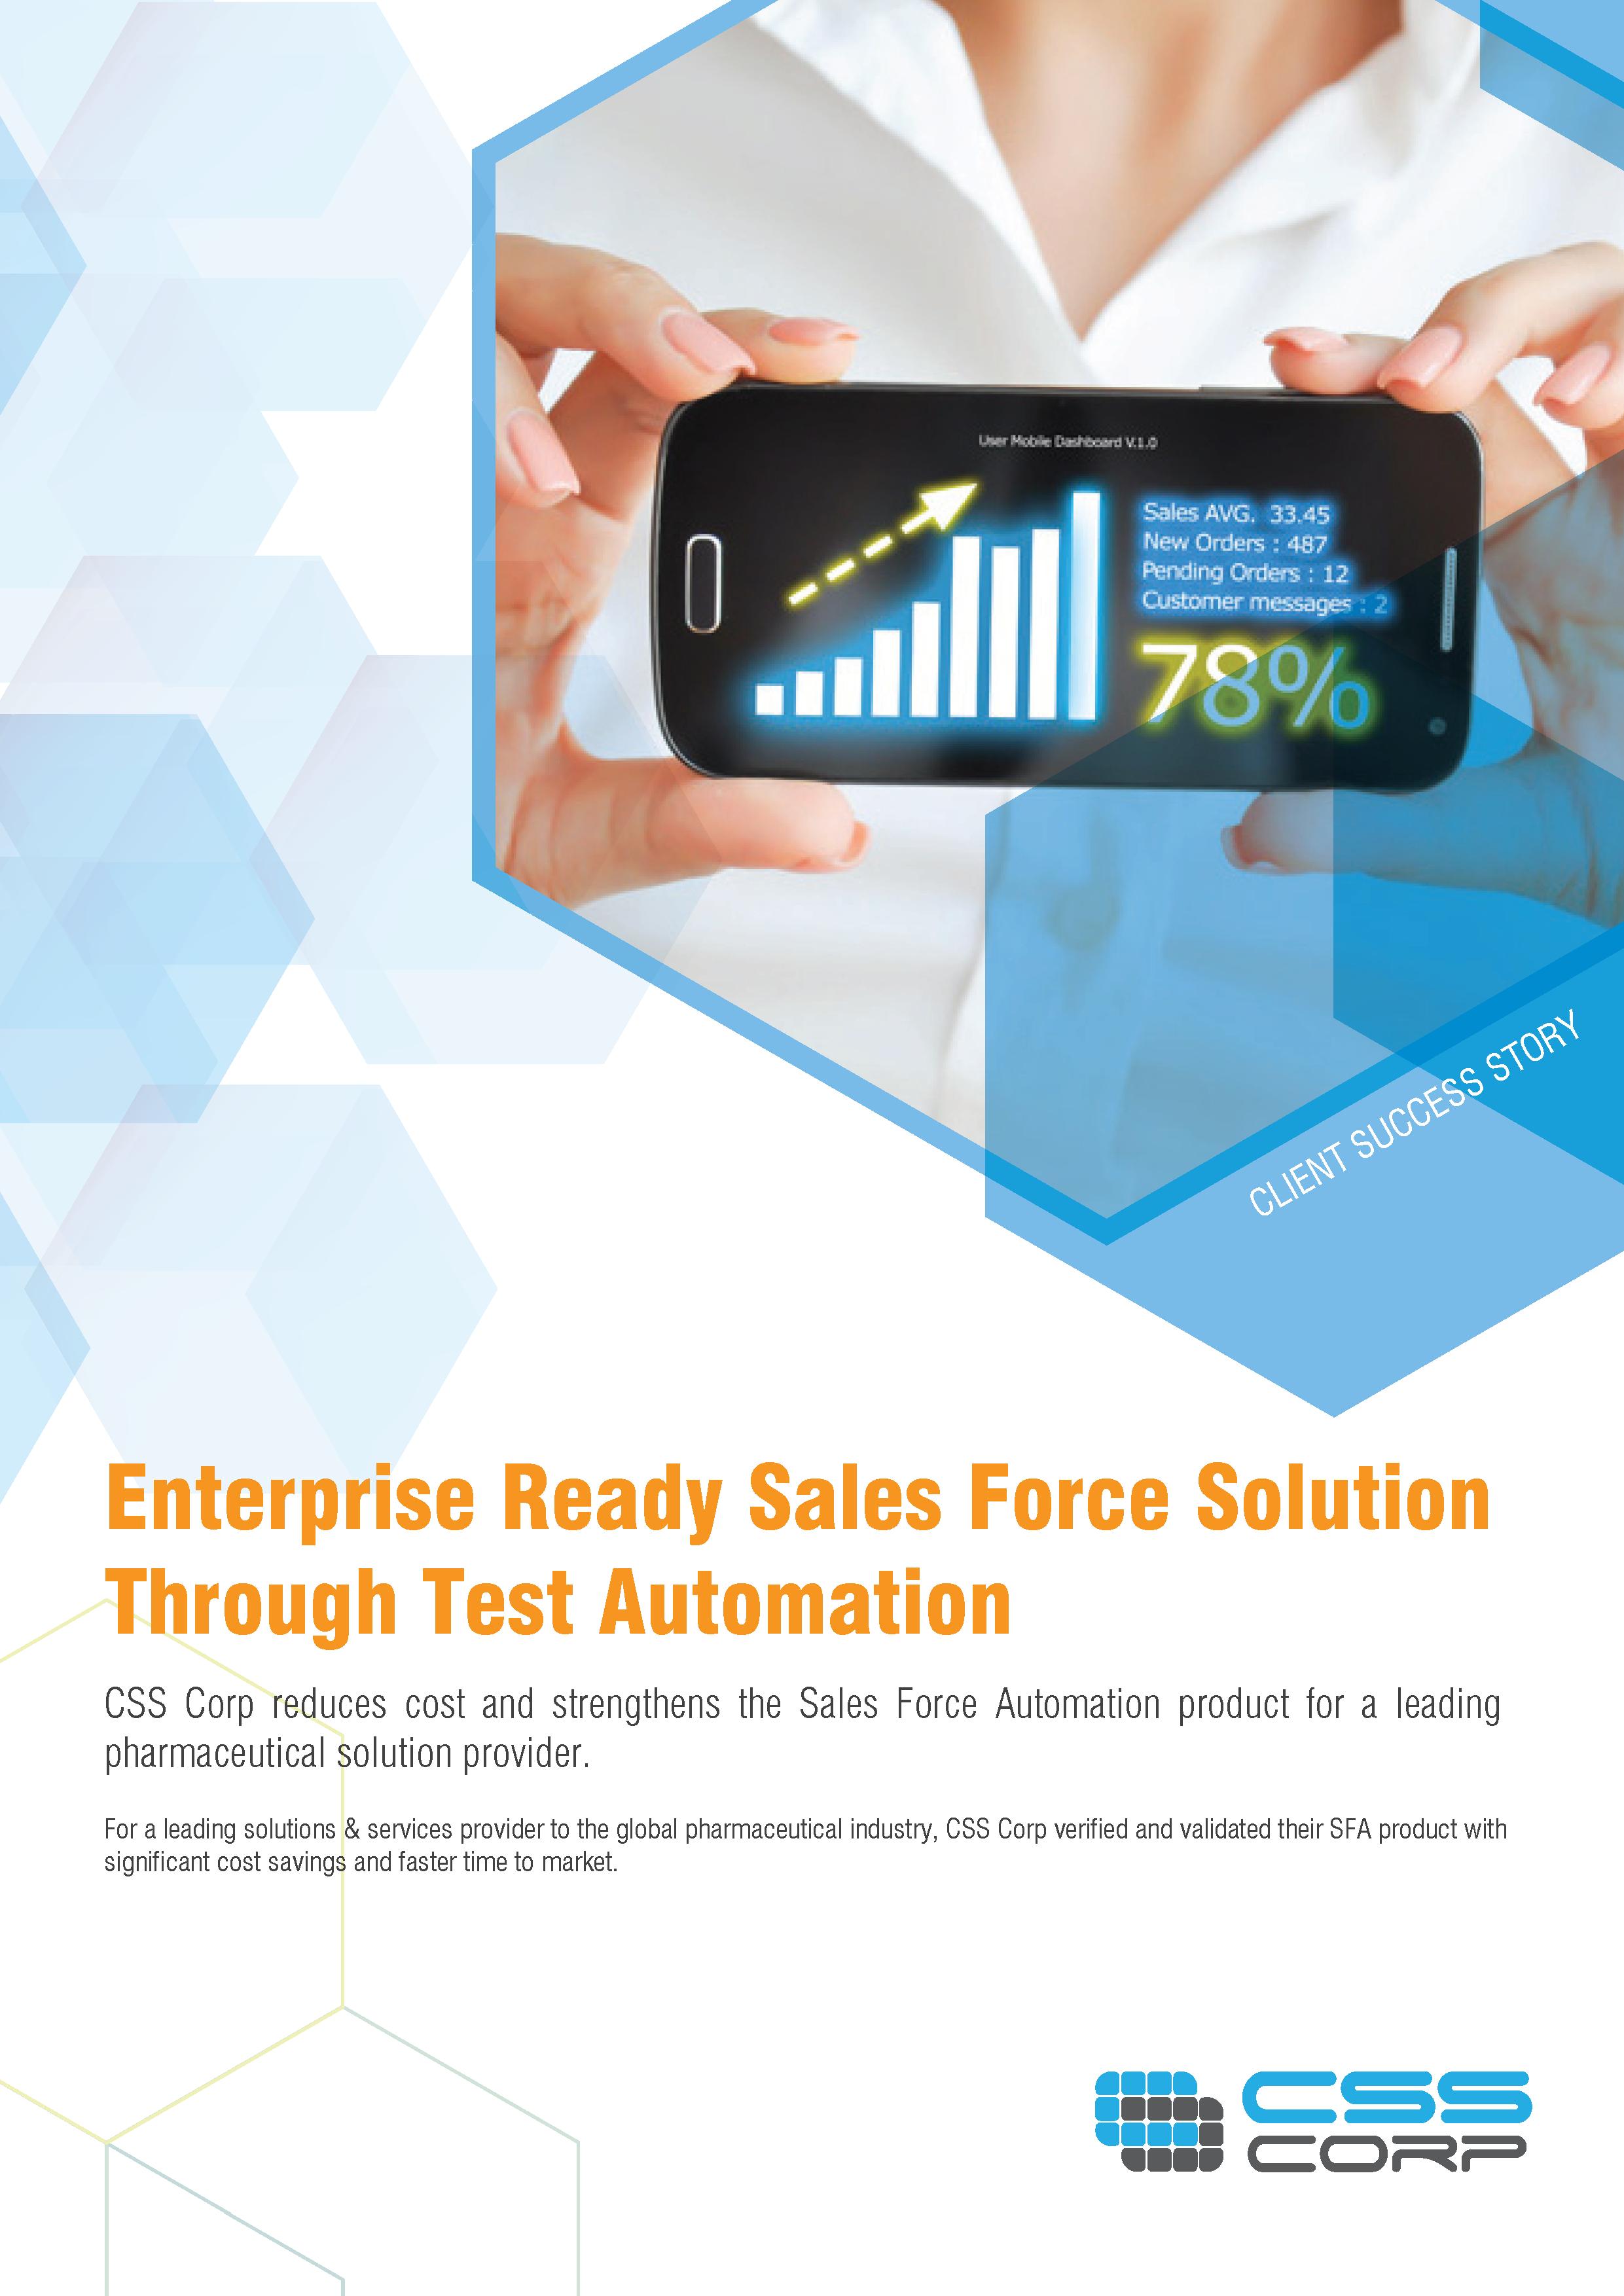 Enterprise Ready Sales Force Solution Through Test Automation